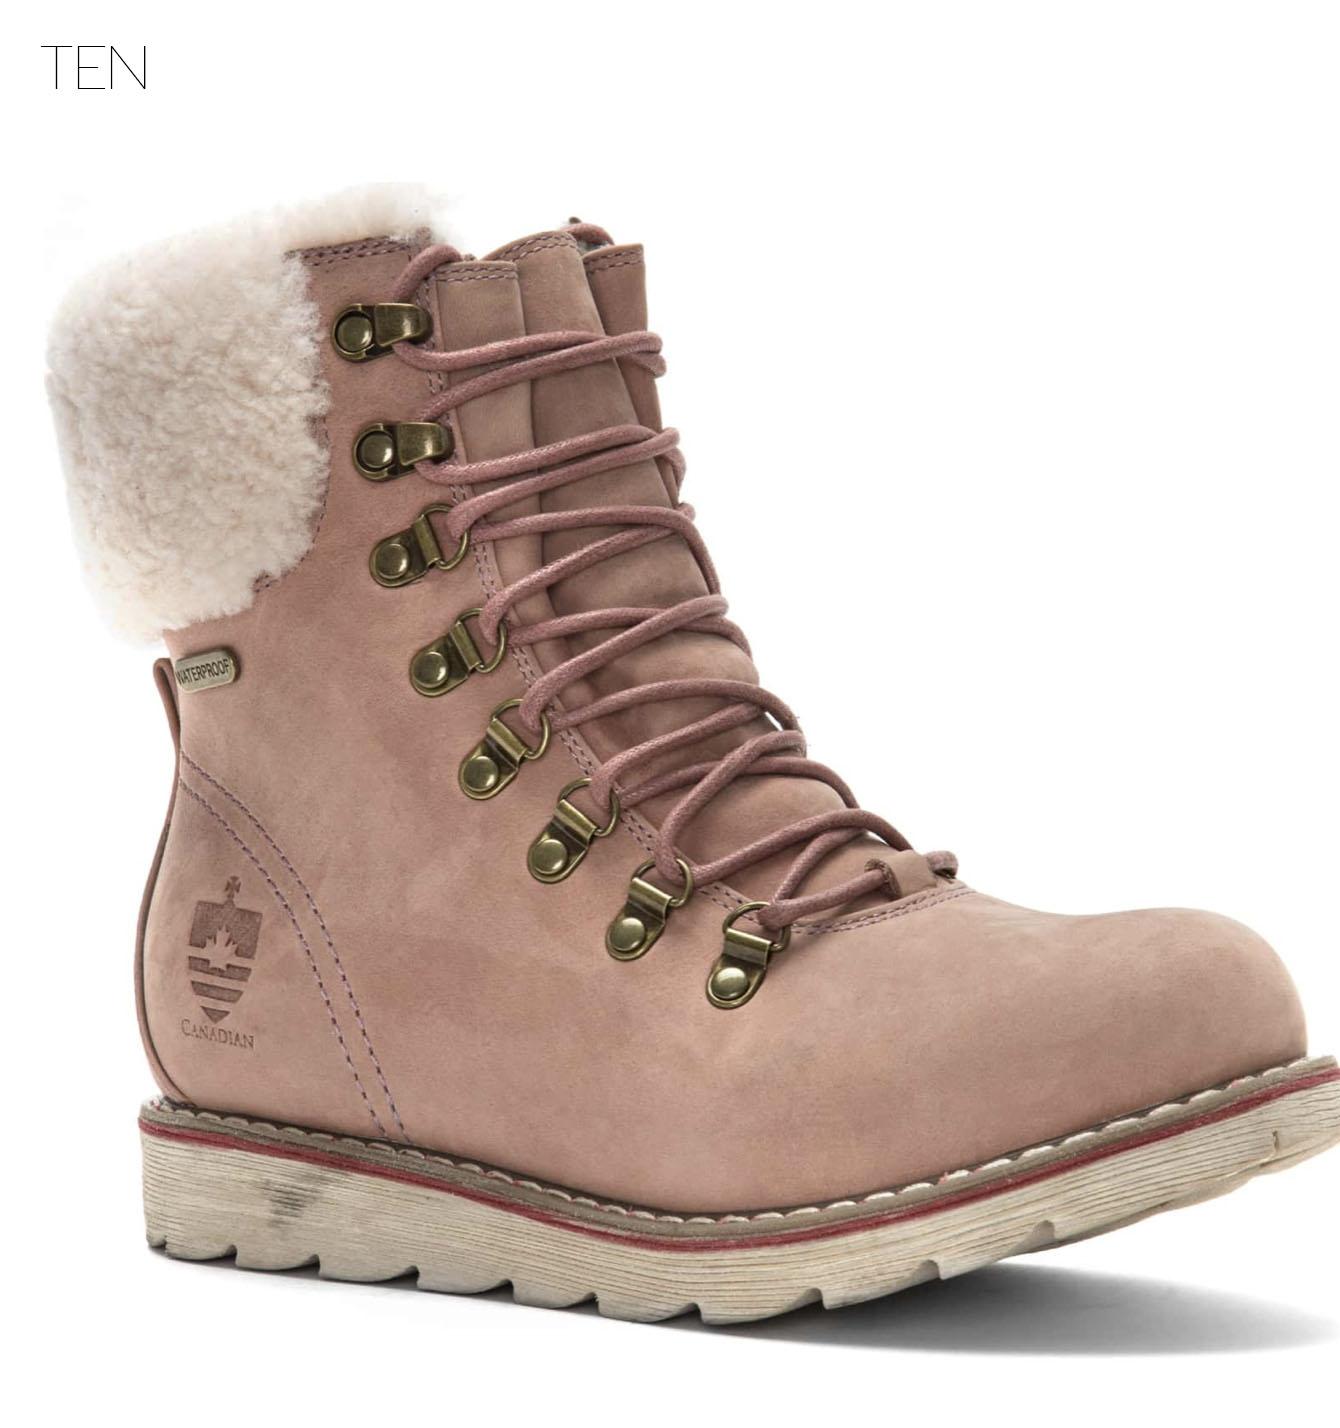 Royal Canadian Boots .jpg